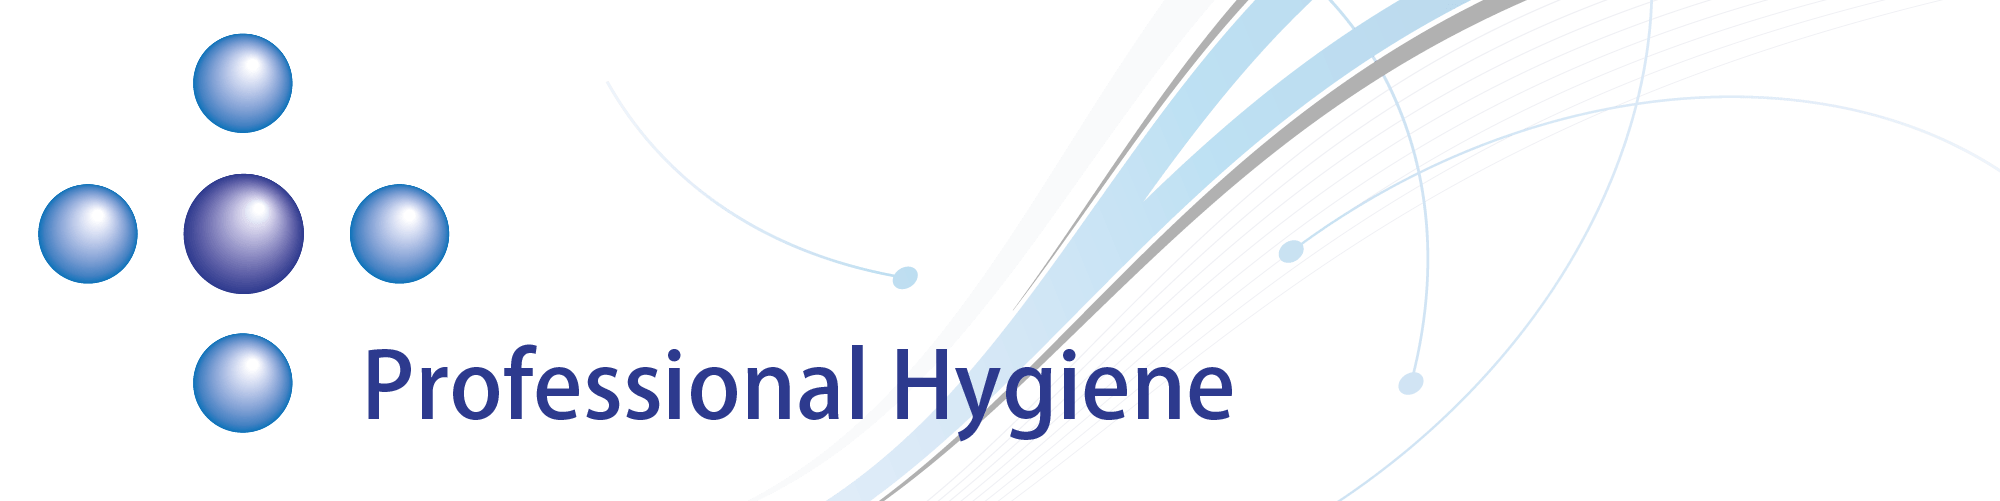 Professional Hygiene Services